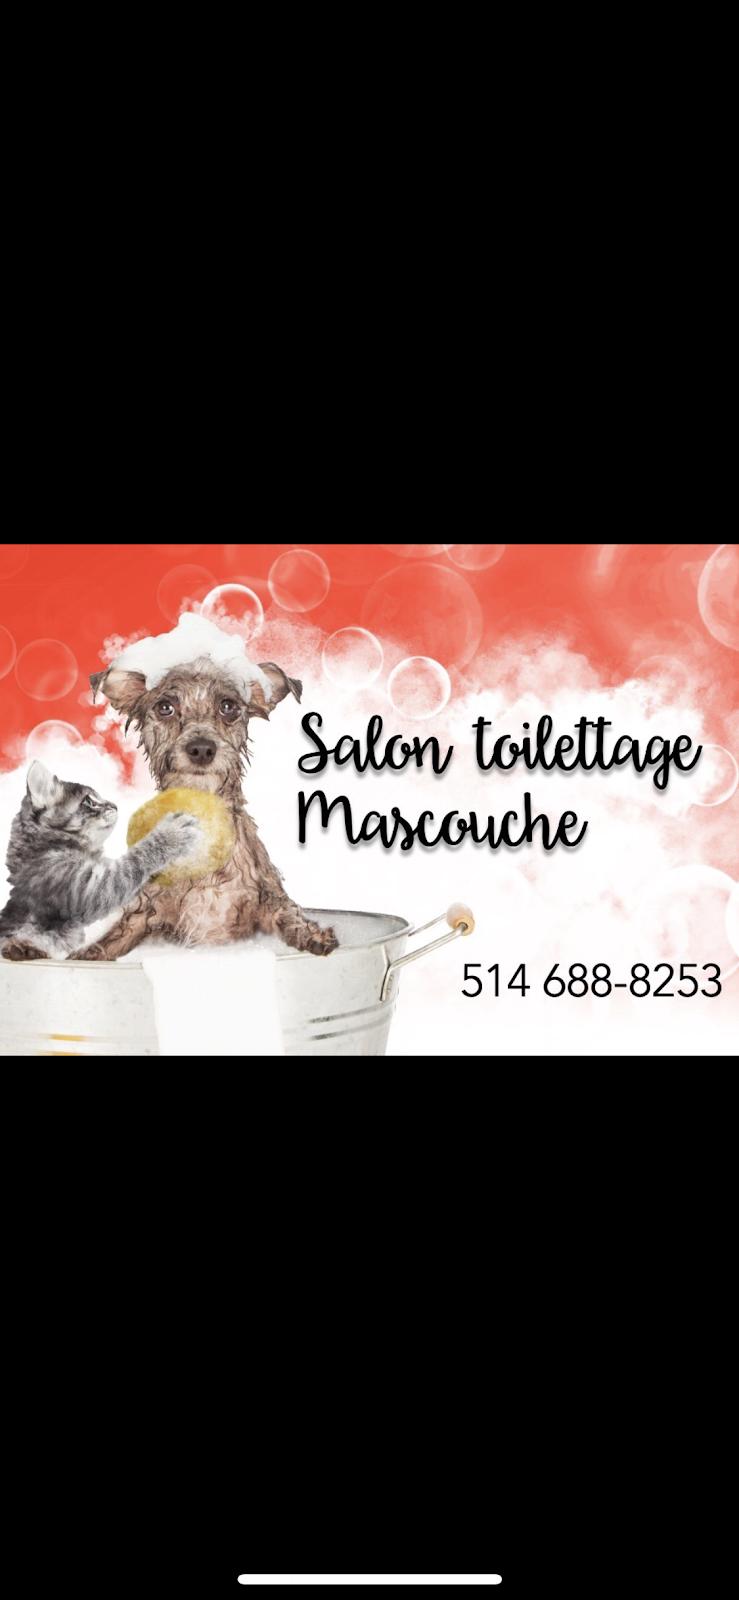 Salon toilettage mascouche   pet store   2741 Chemin Ste Marie, Mascouche, QC J7K 1N2, Canada   5146888253 OR +1 514-688-8253